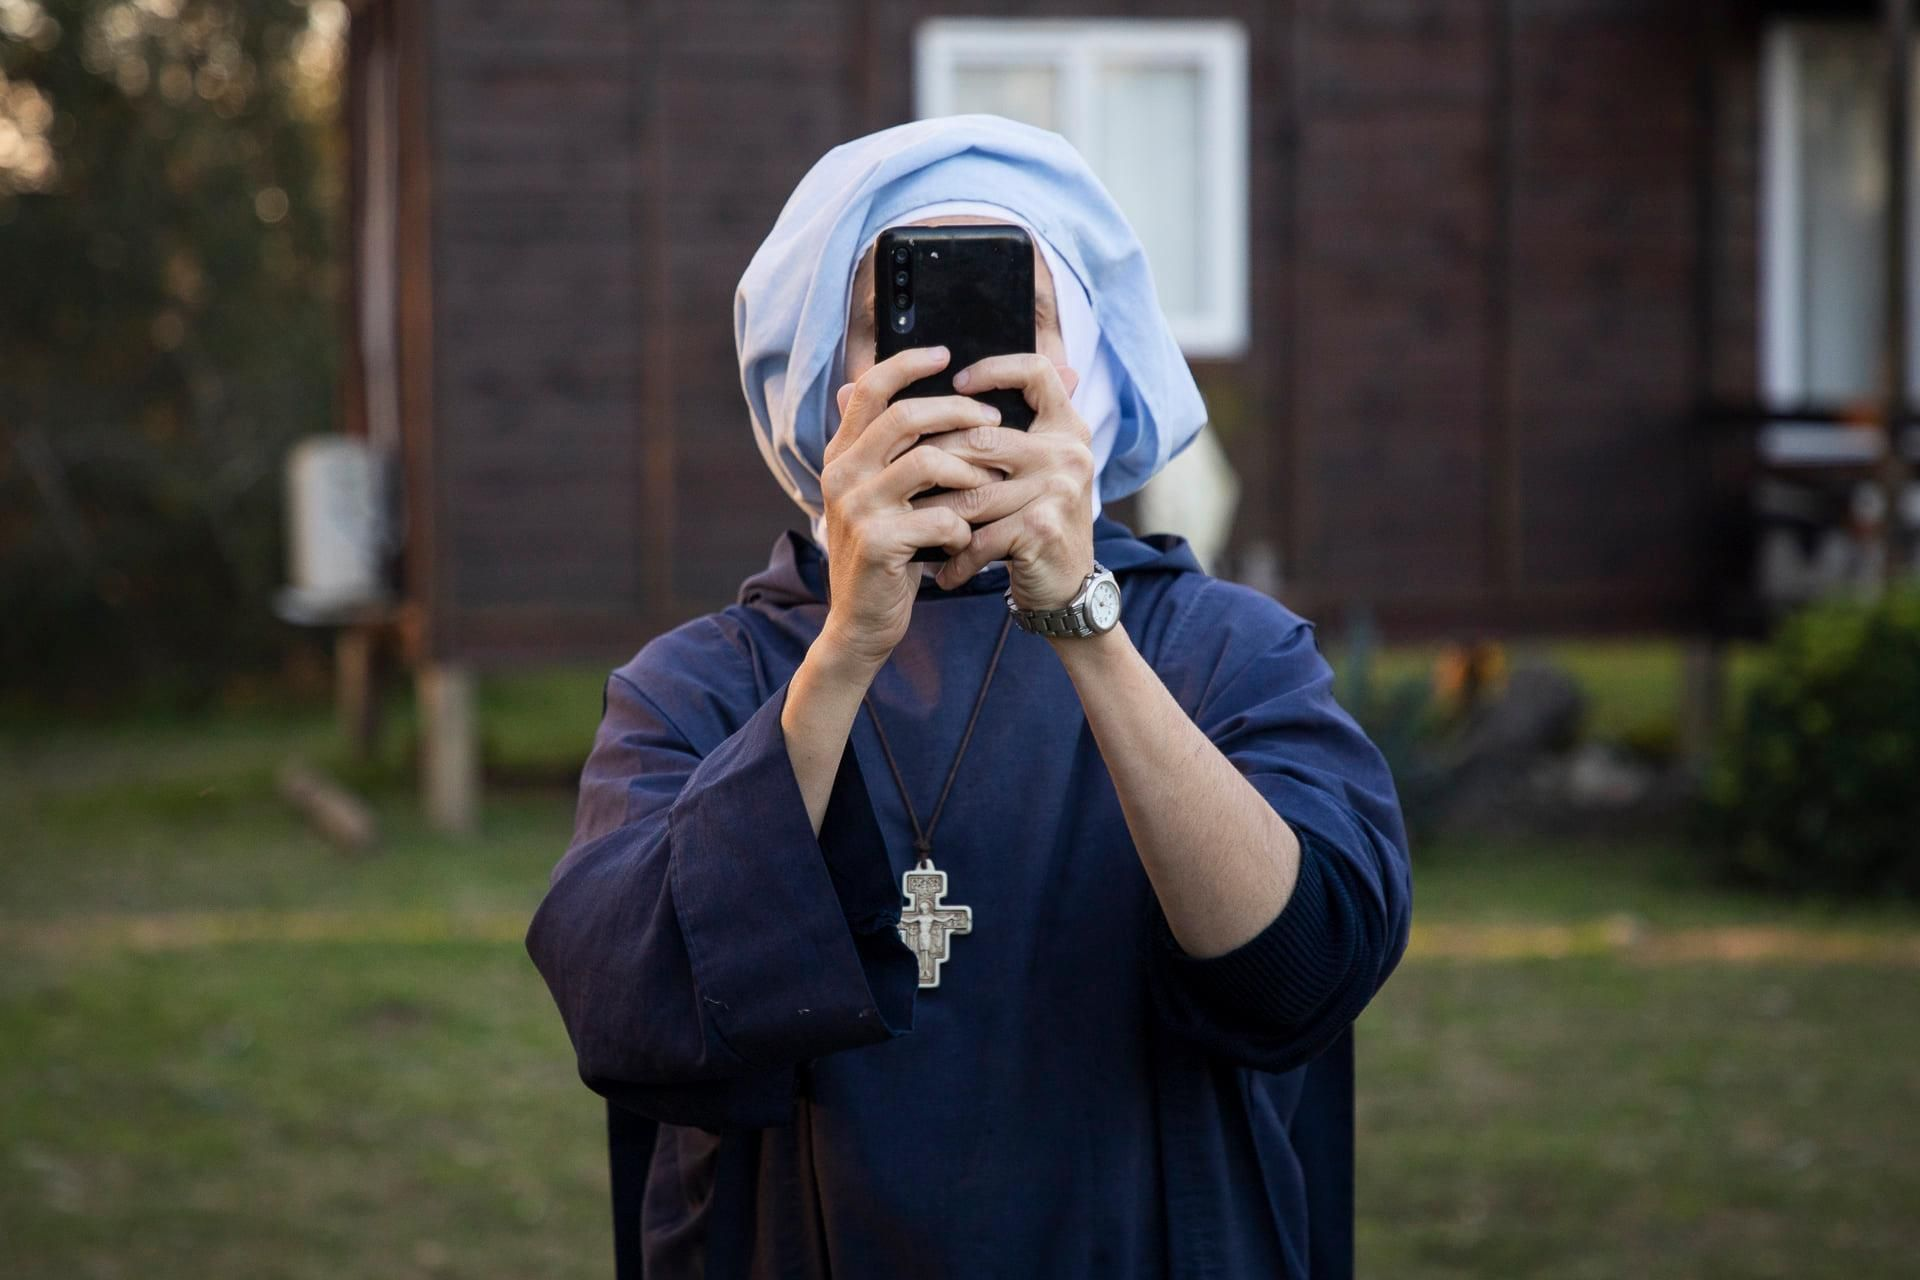 La monja fue desalojada del predio (Foto: Leo Crovetto - Punta Querandí)